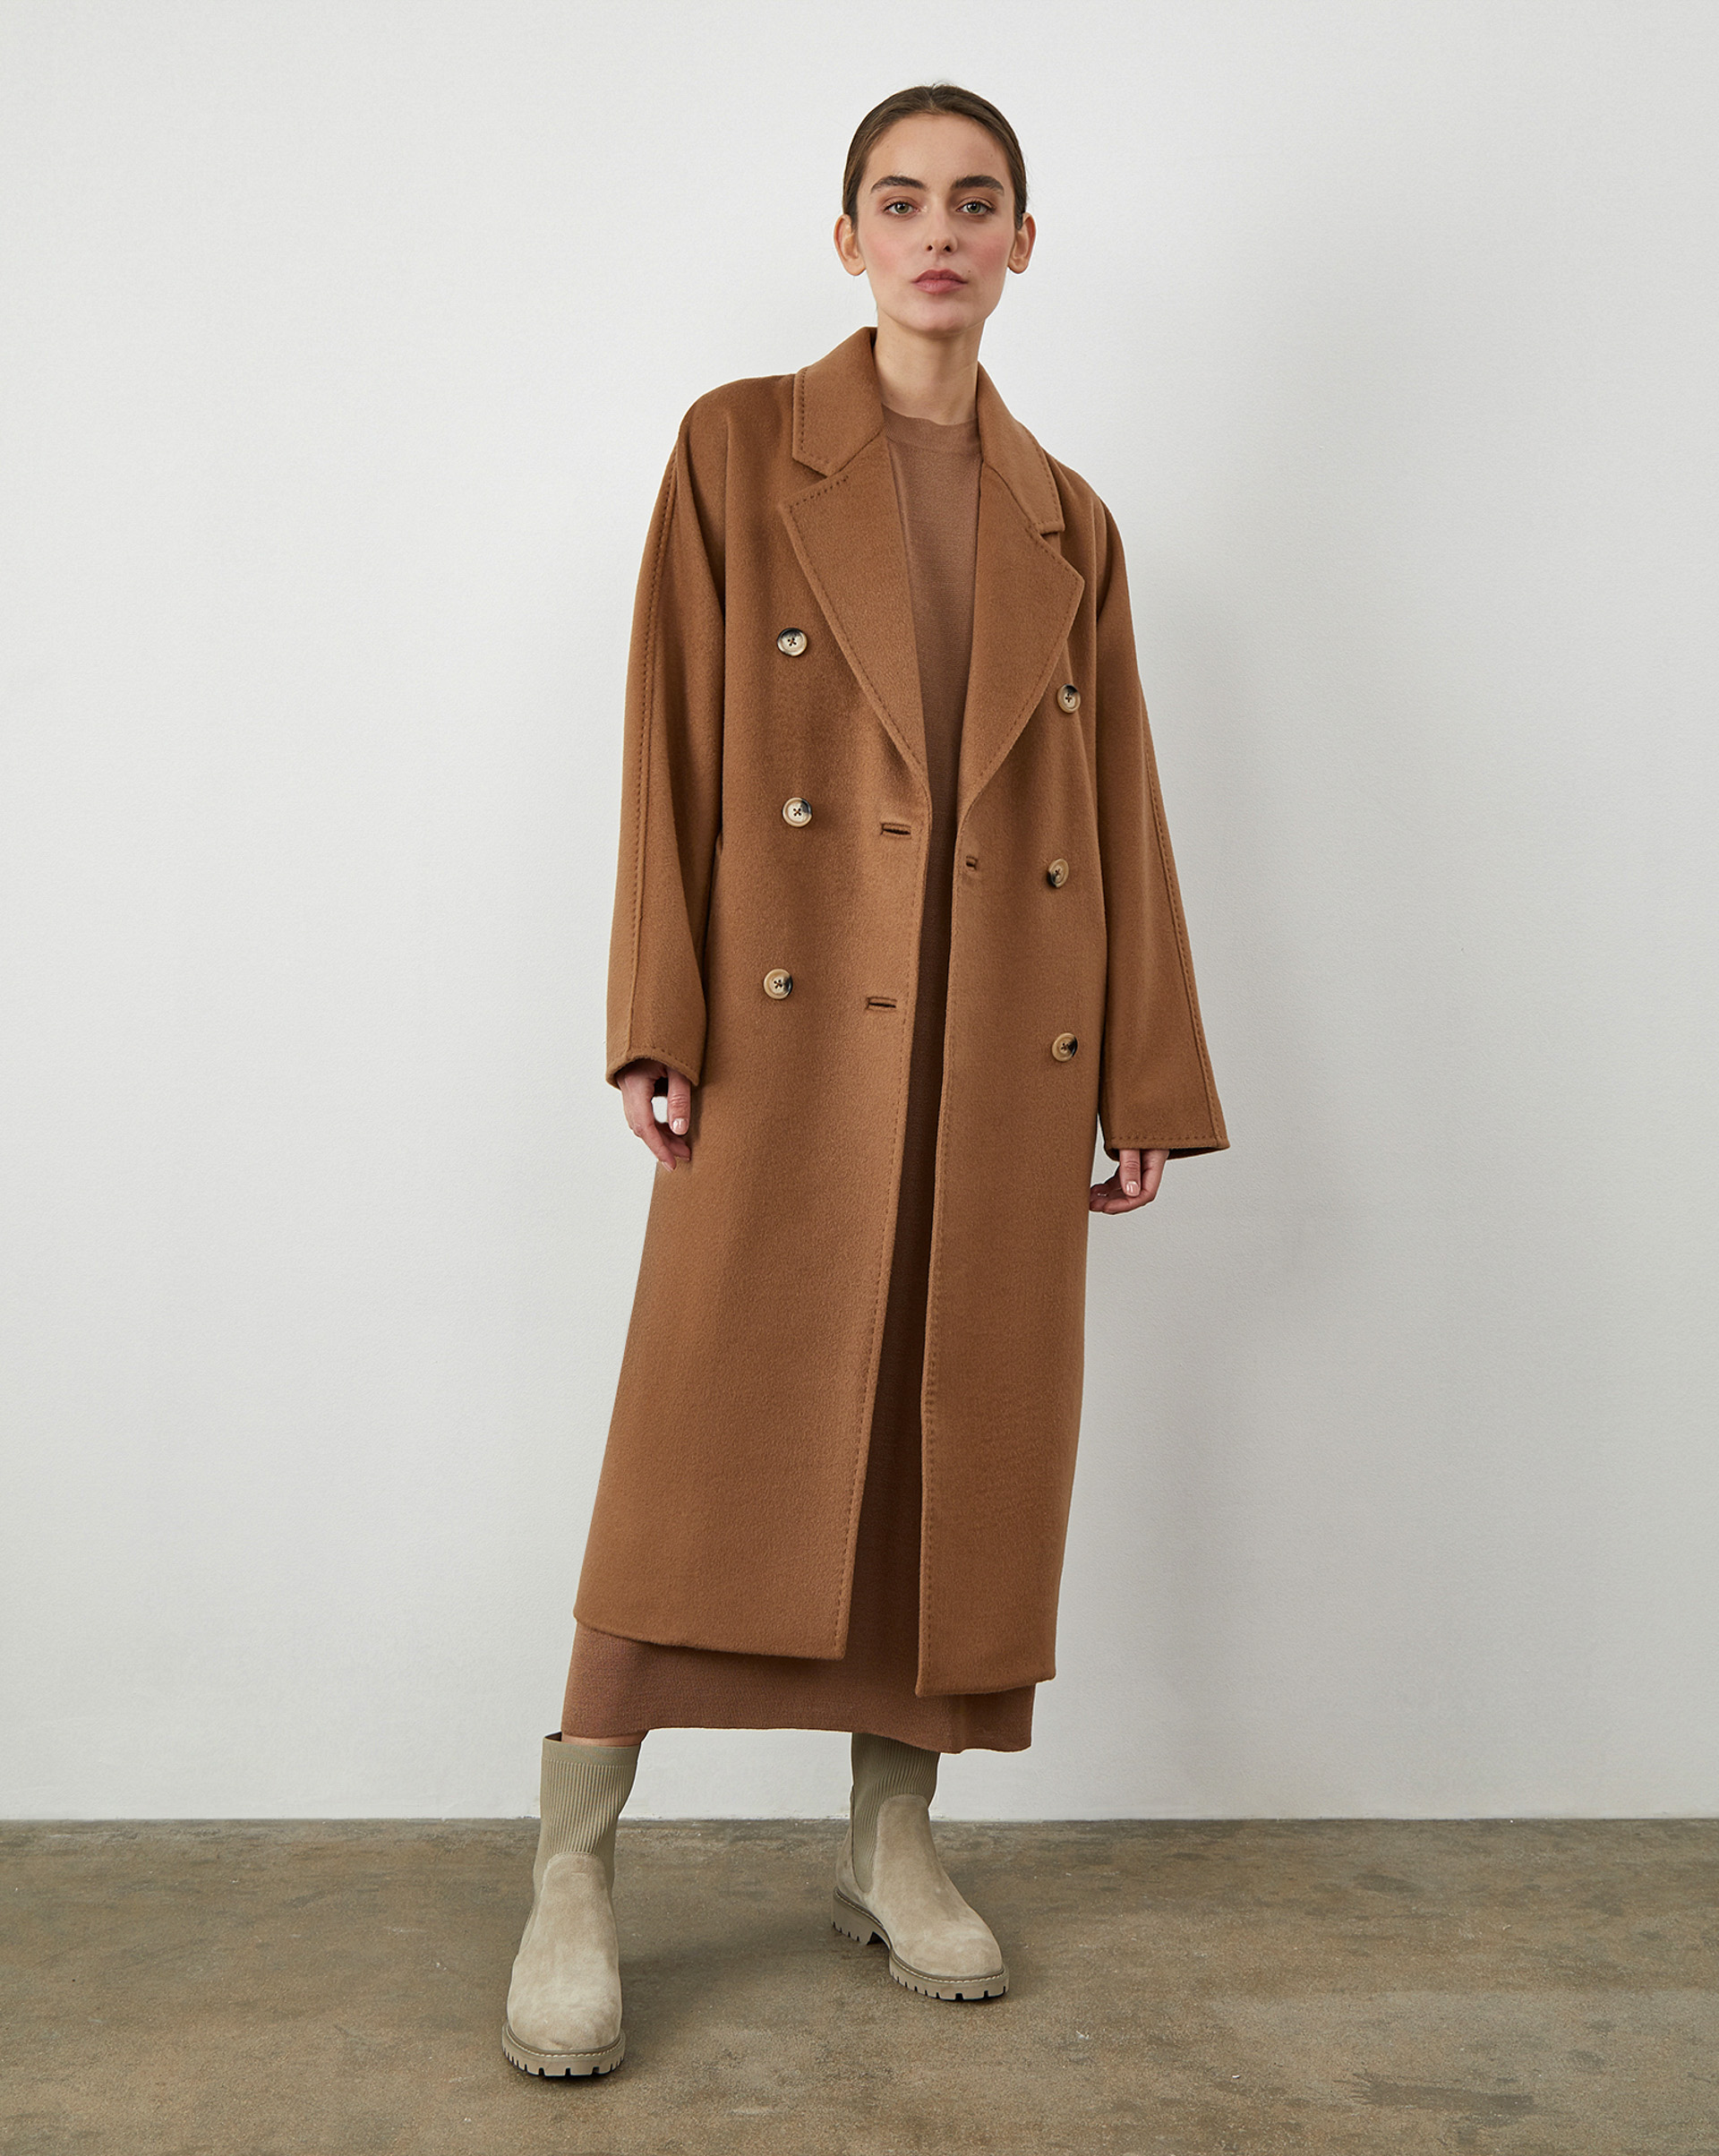 12Storeez Пальто двубортное, на поясе 12storeez пальто на поясе c шёлком